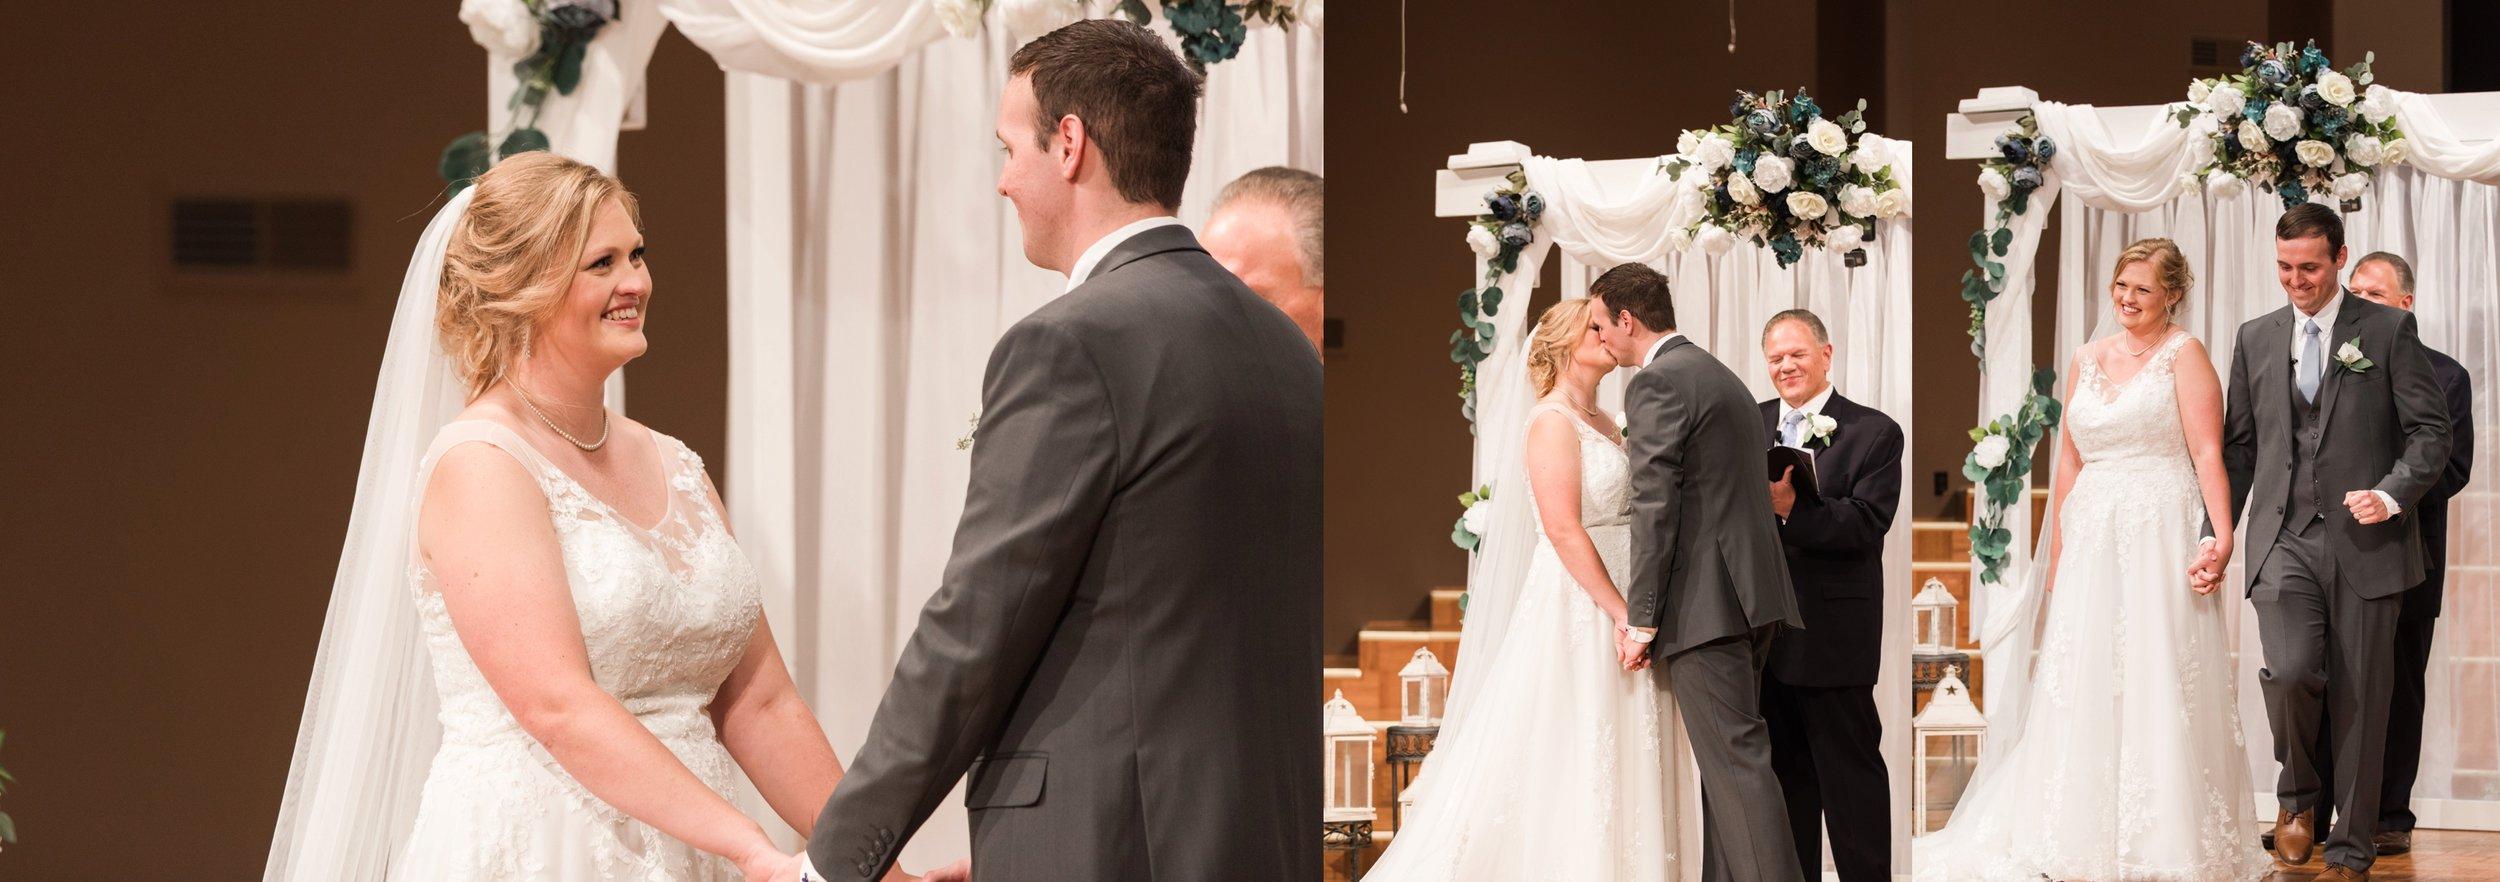 Komorebiphotography-Brand-Fleenor-WeddingCeremony